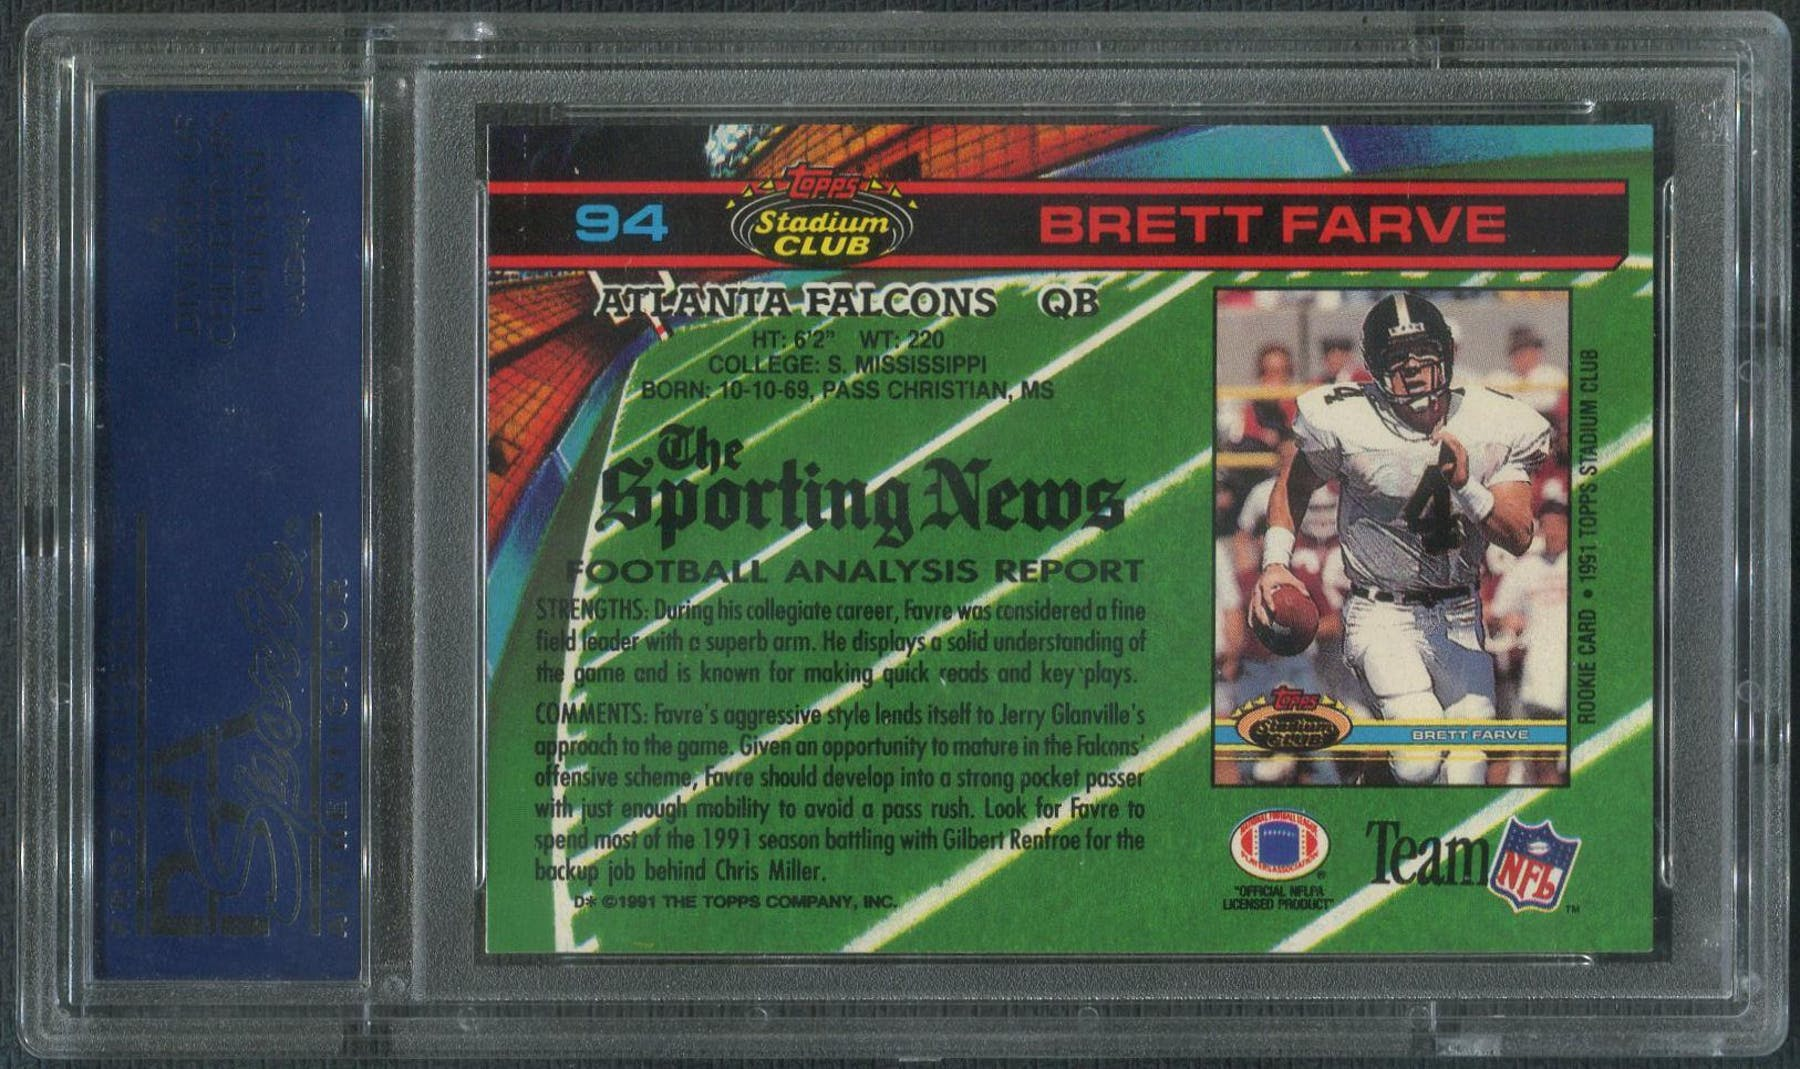 1991 Topps Stadium Club Football 94 Brett Favre Rookie PSA 10 GEM MT